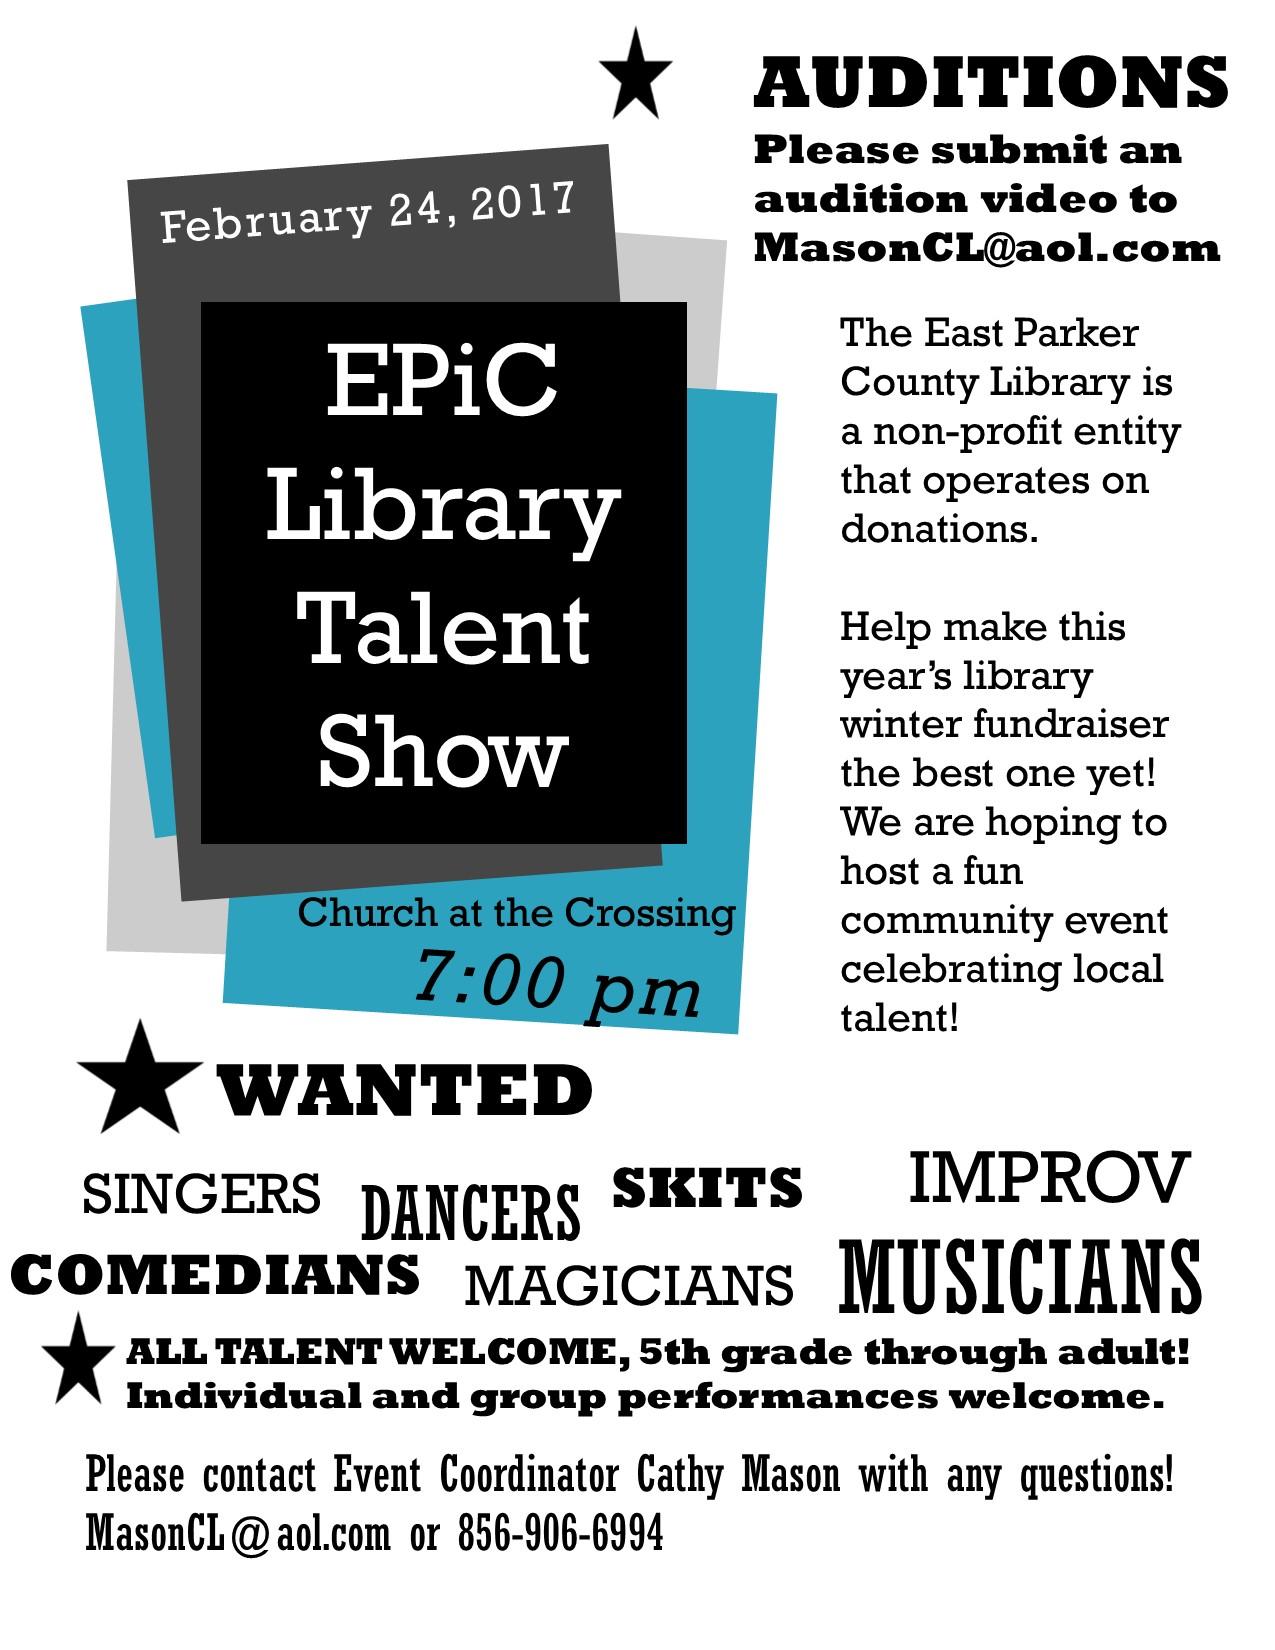 Talent Show Flyer | Talent Show Audition Flyer Jpg